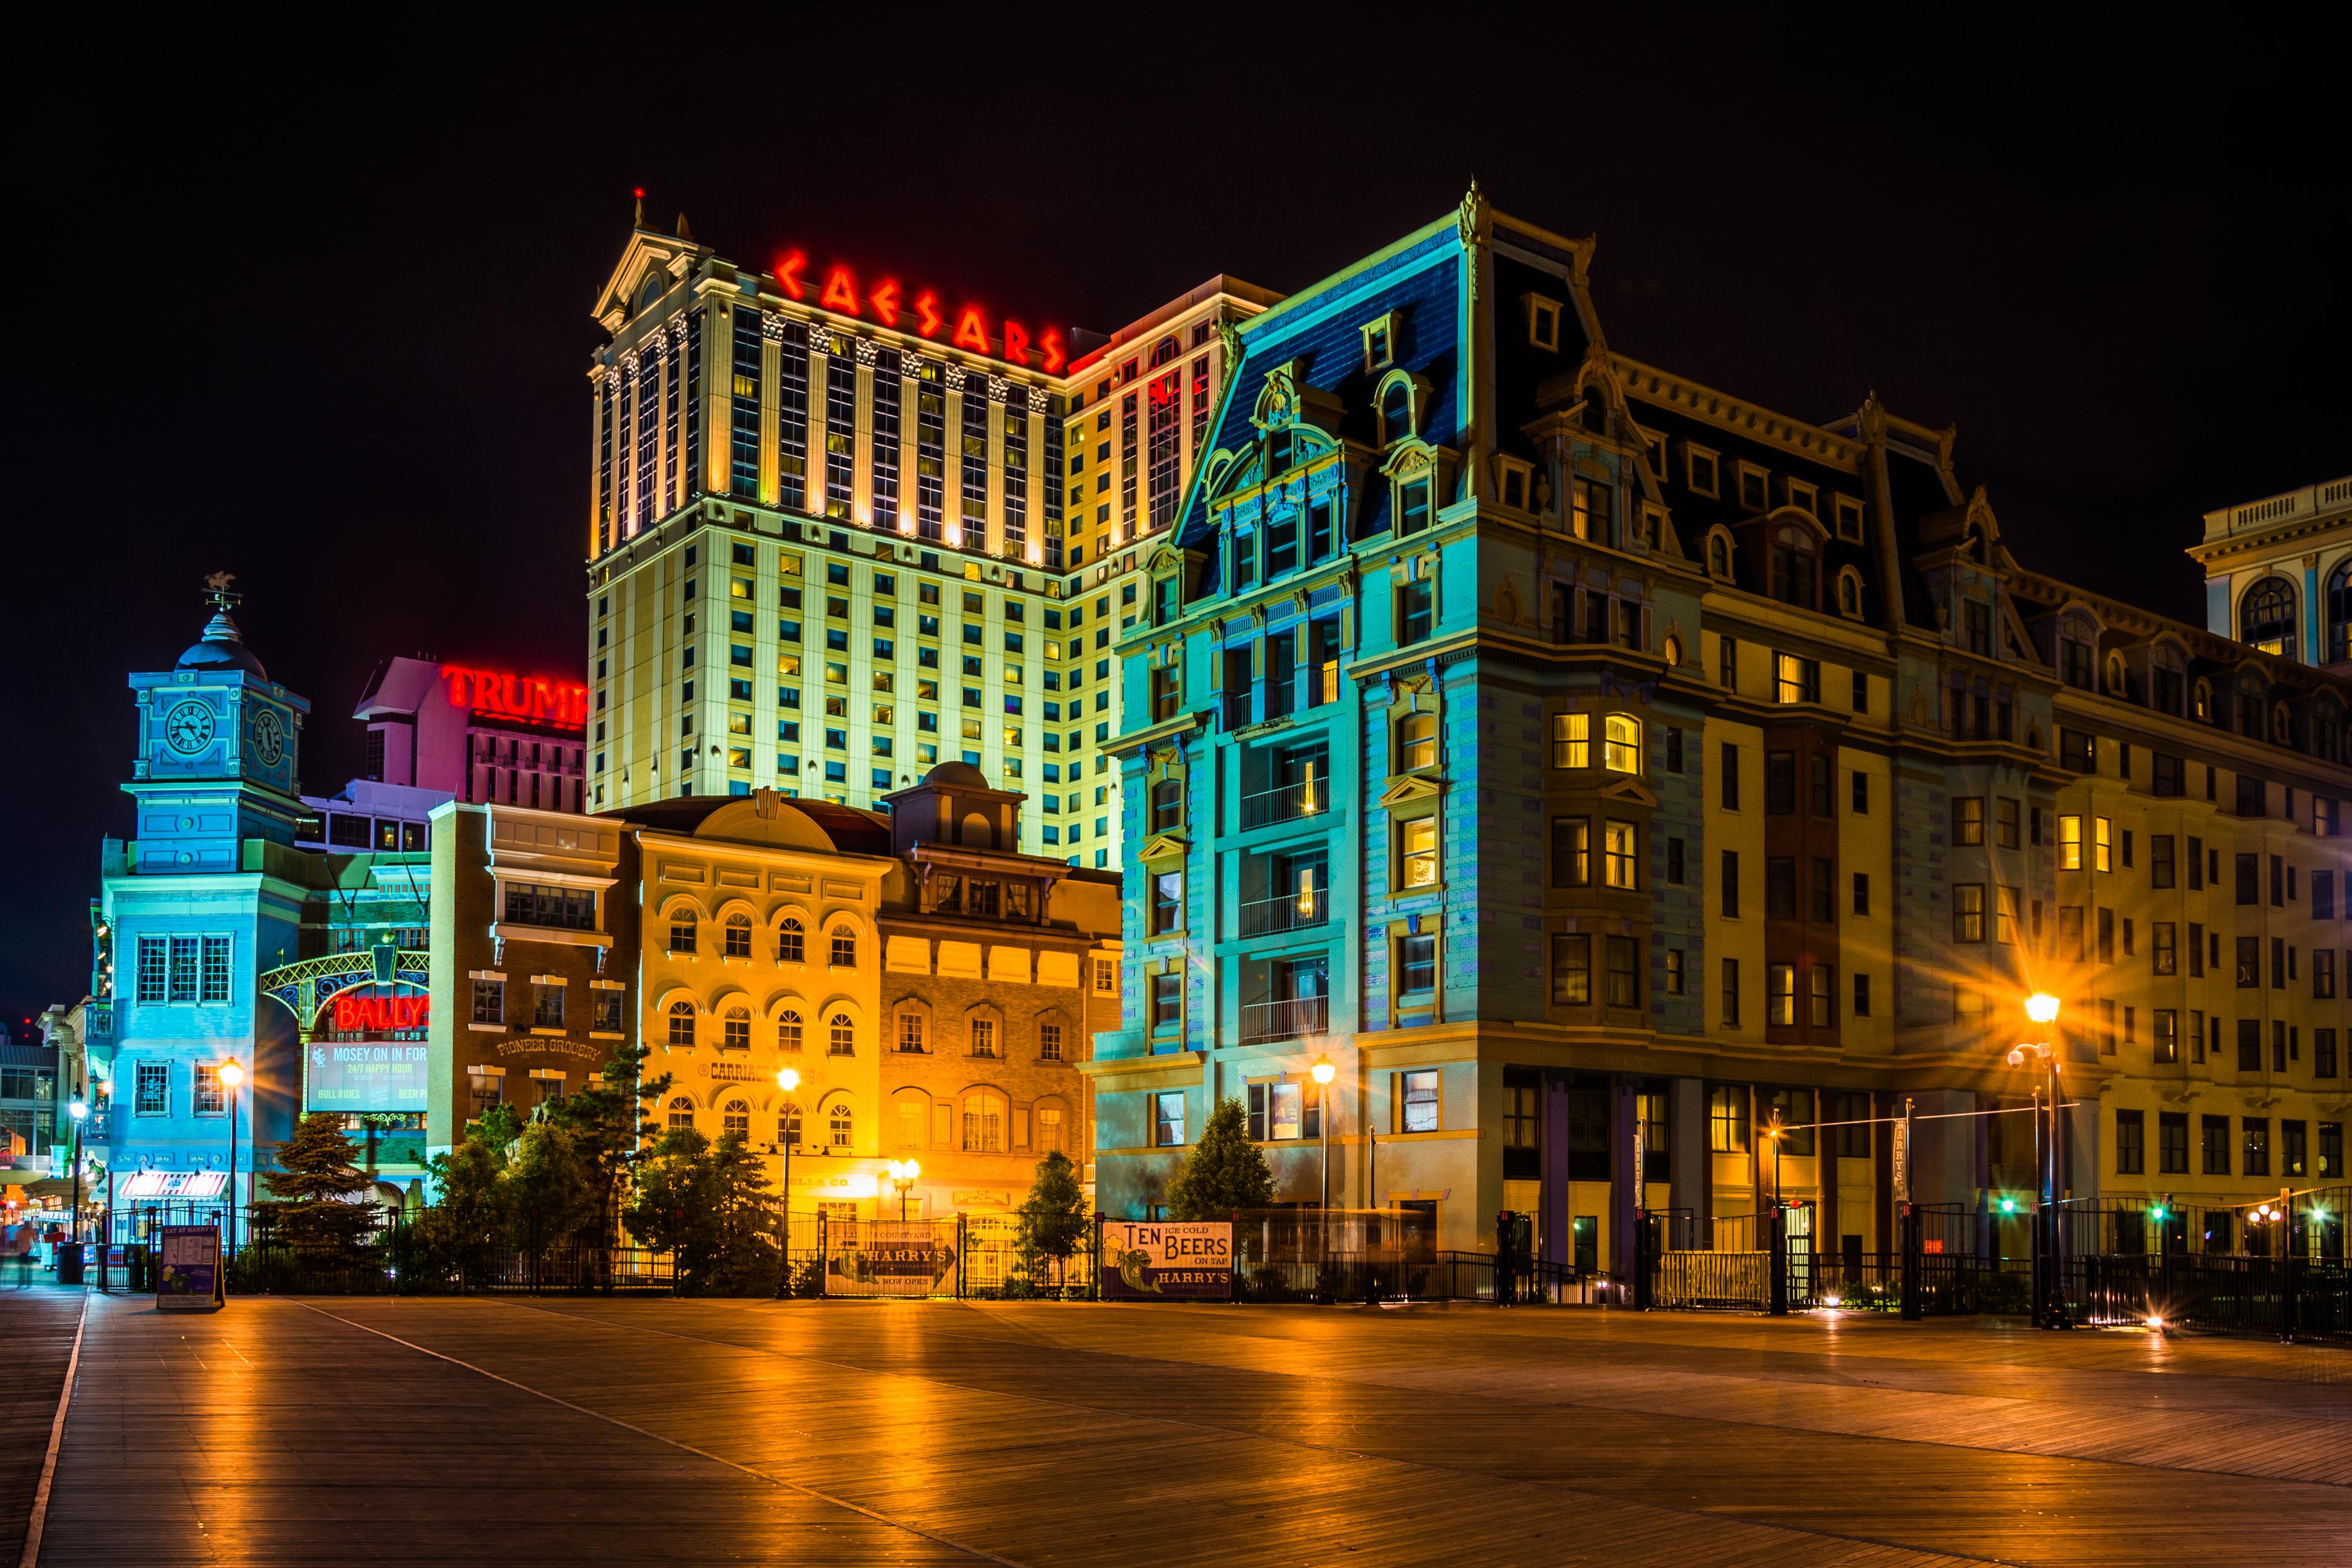 Atlantic City boardwalk at night.